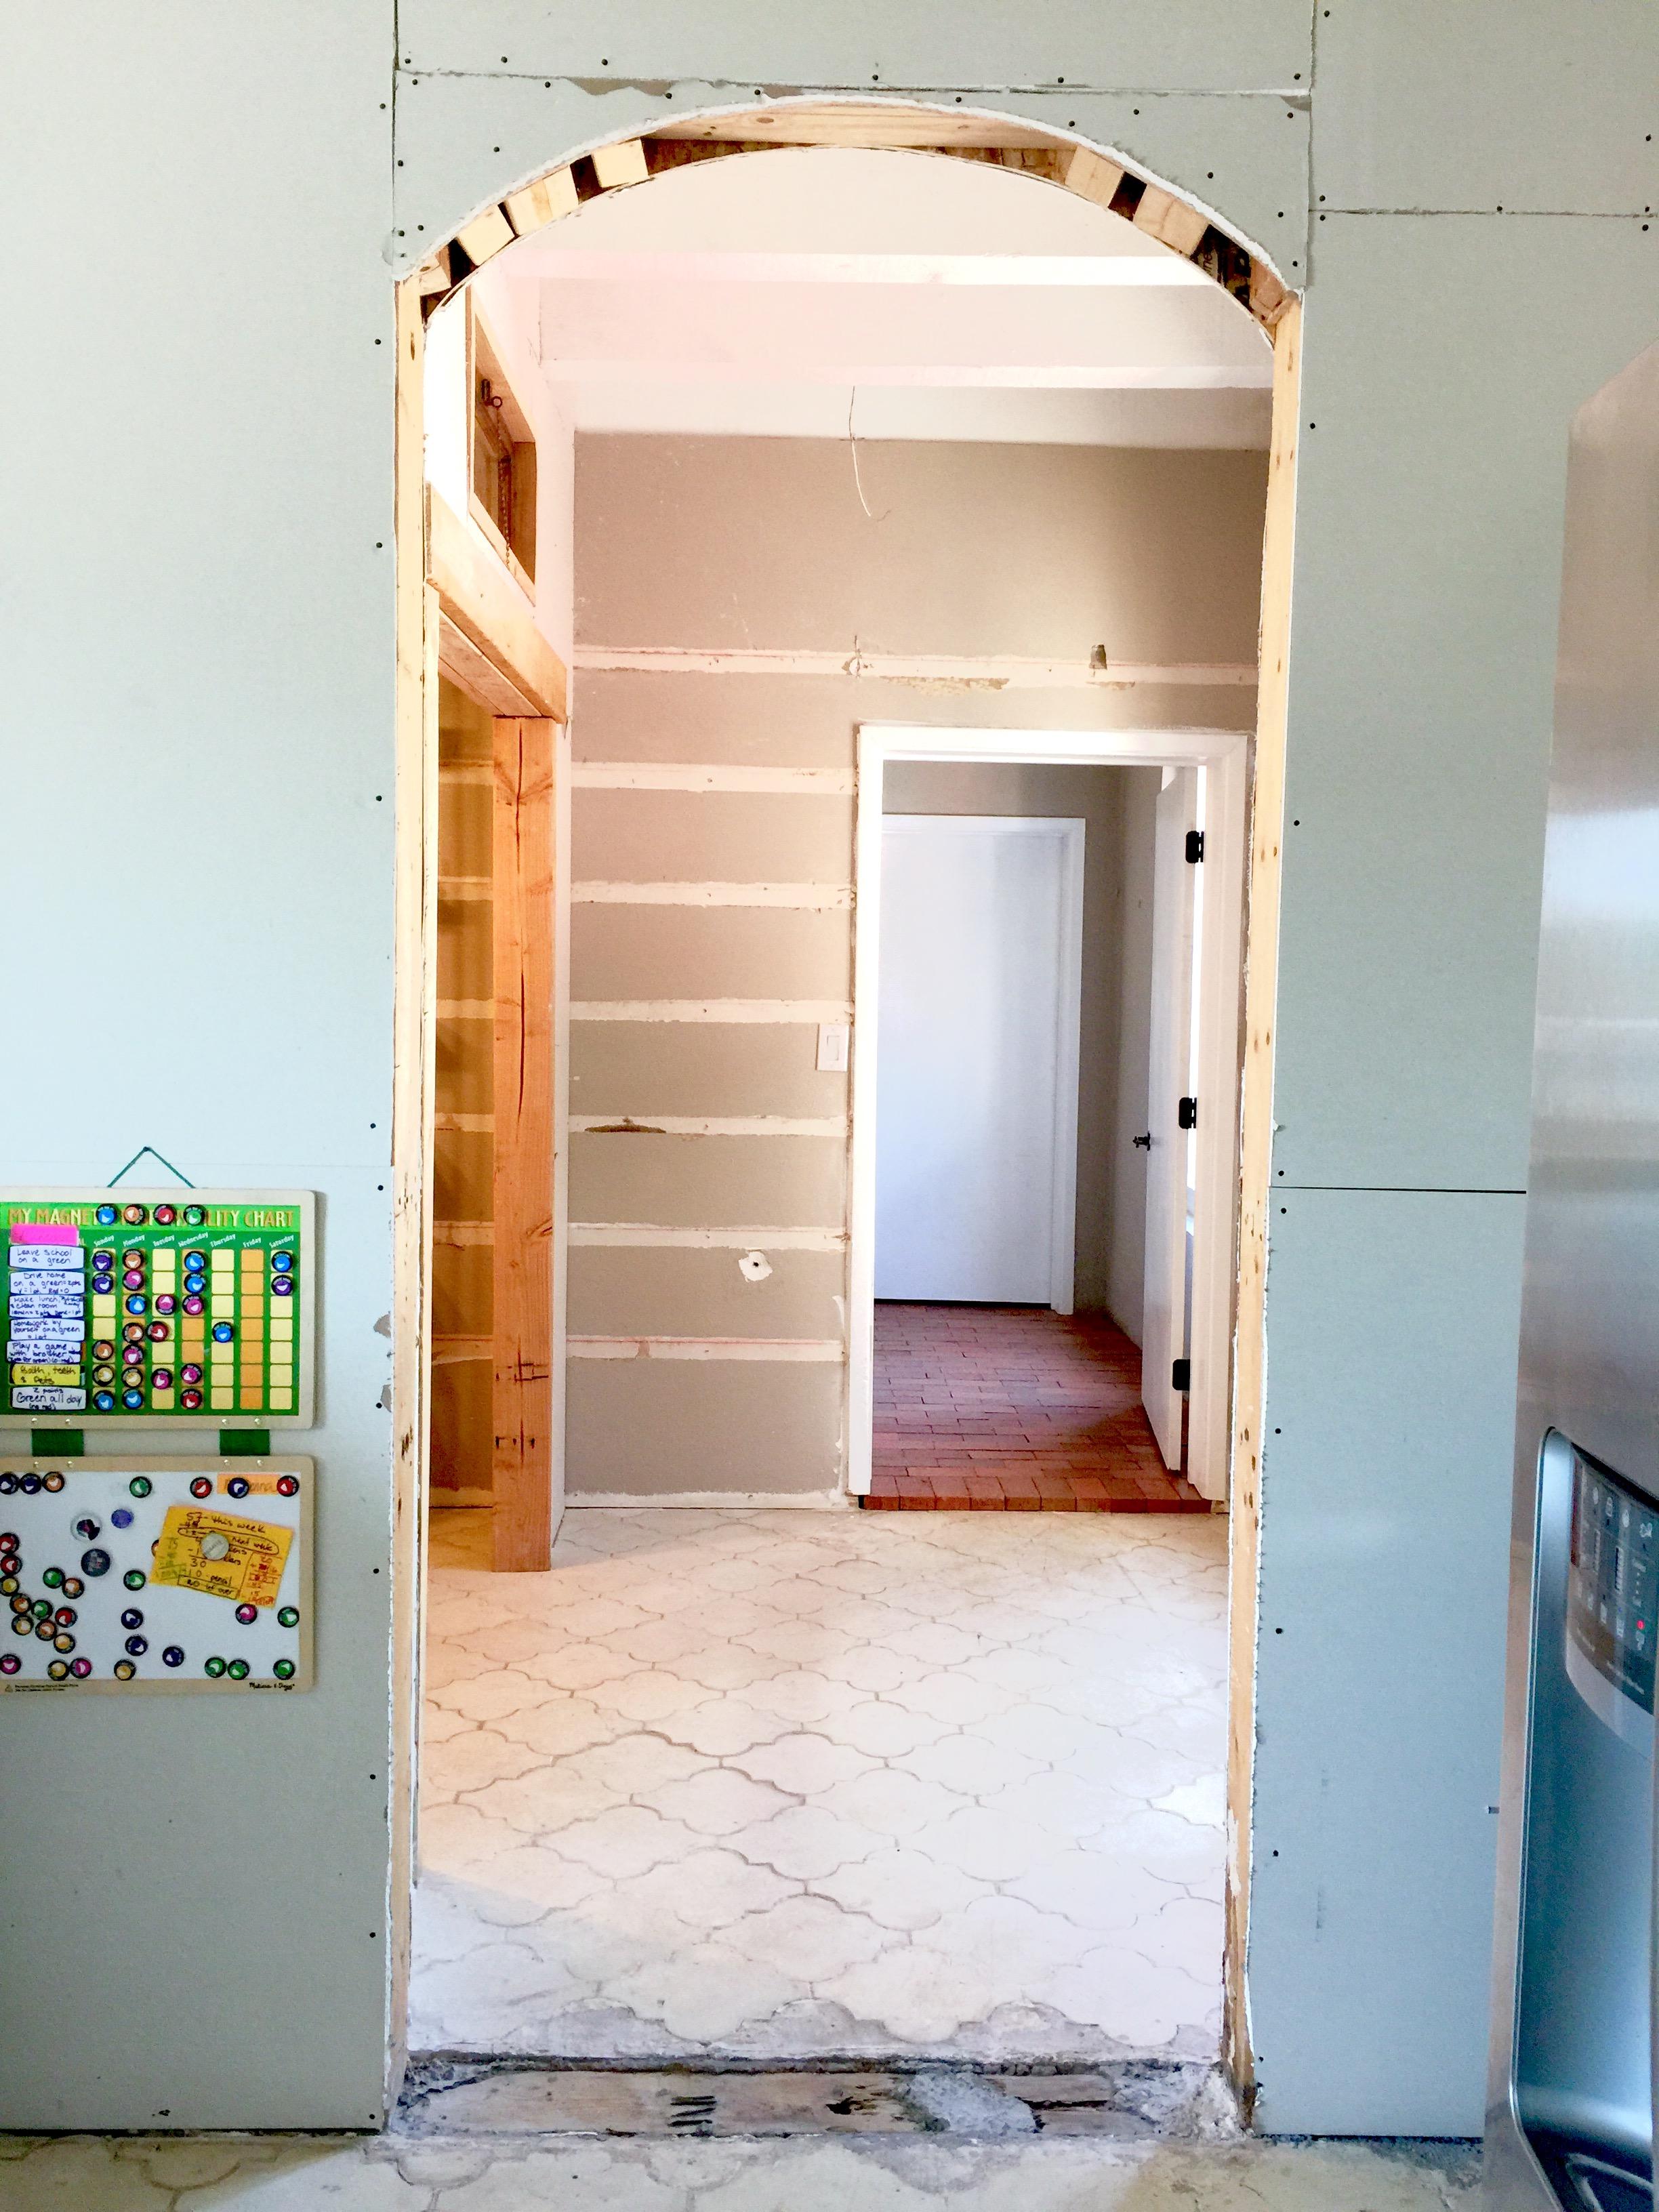 A New Mexico Farmhouse: Renovation- 5